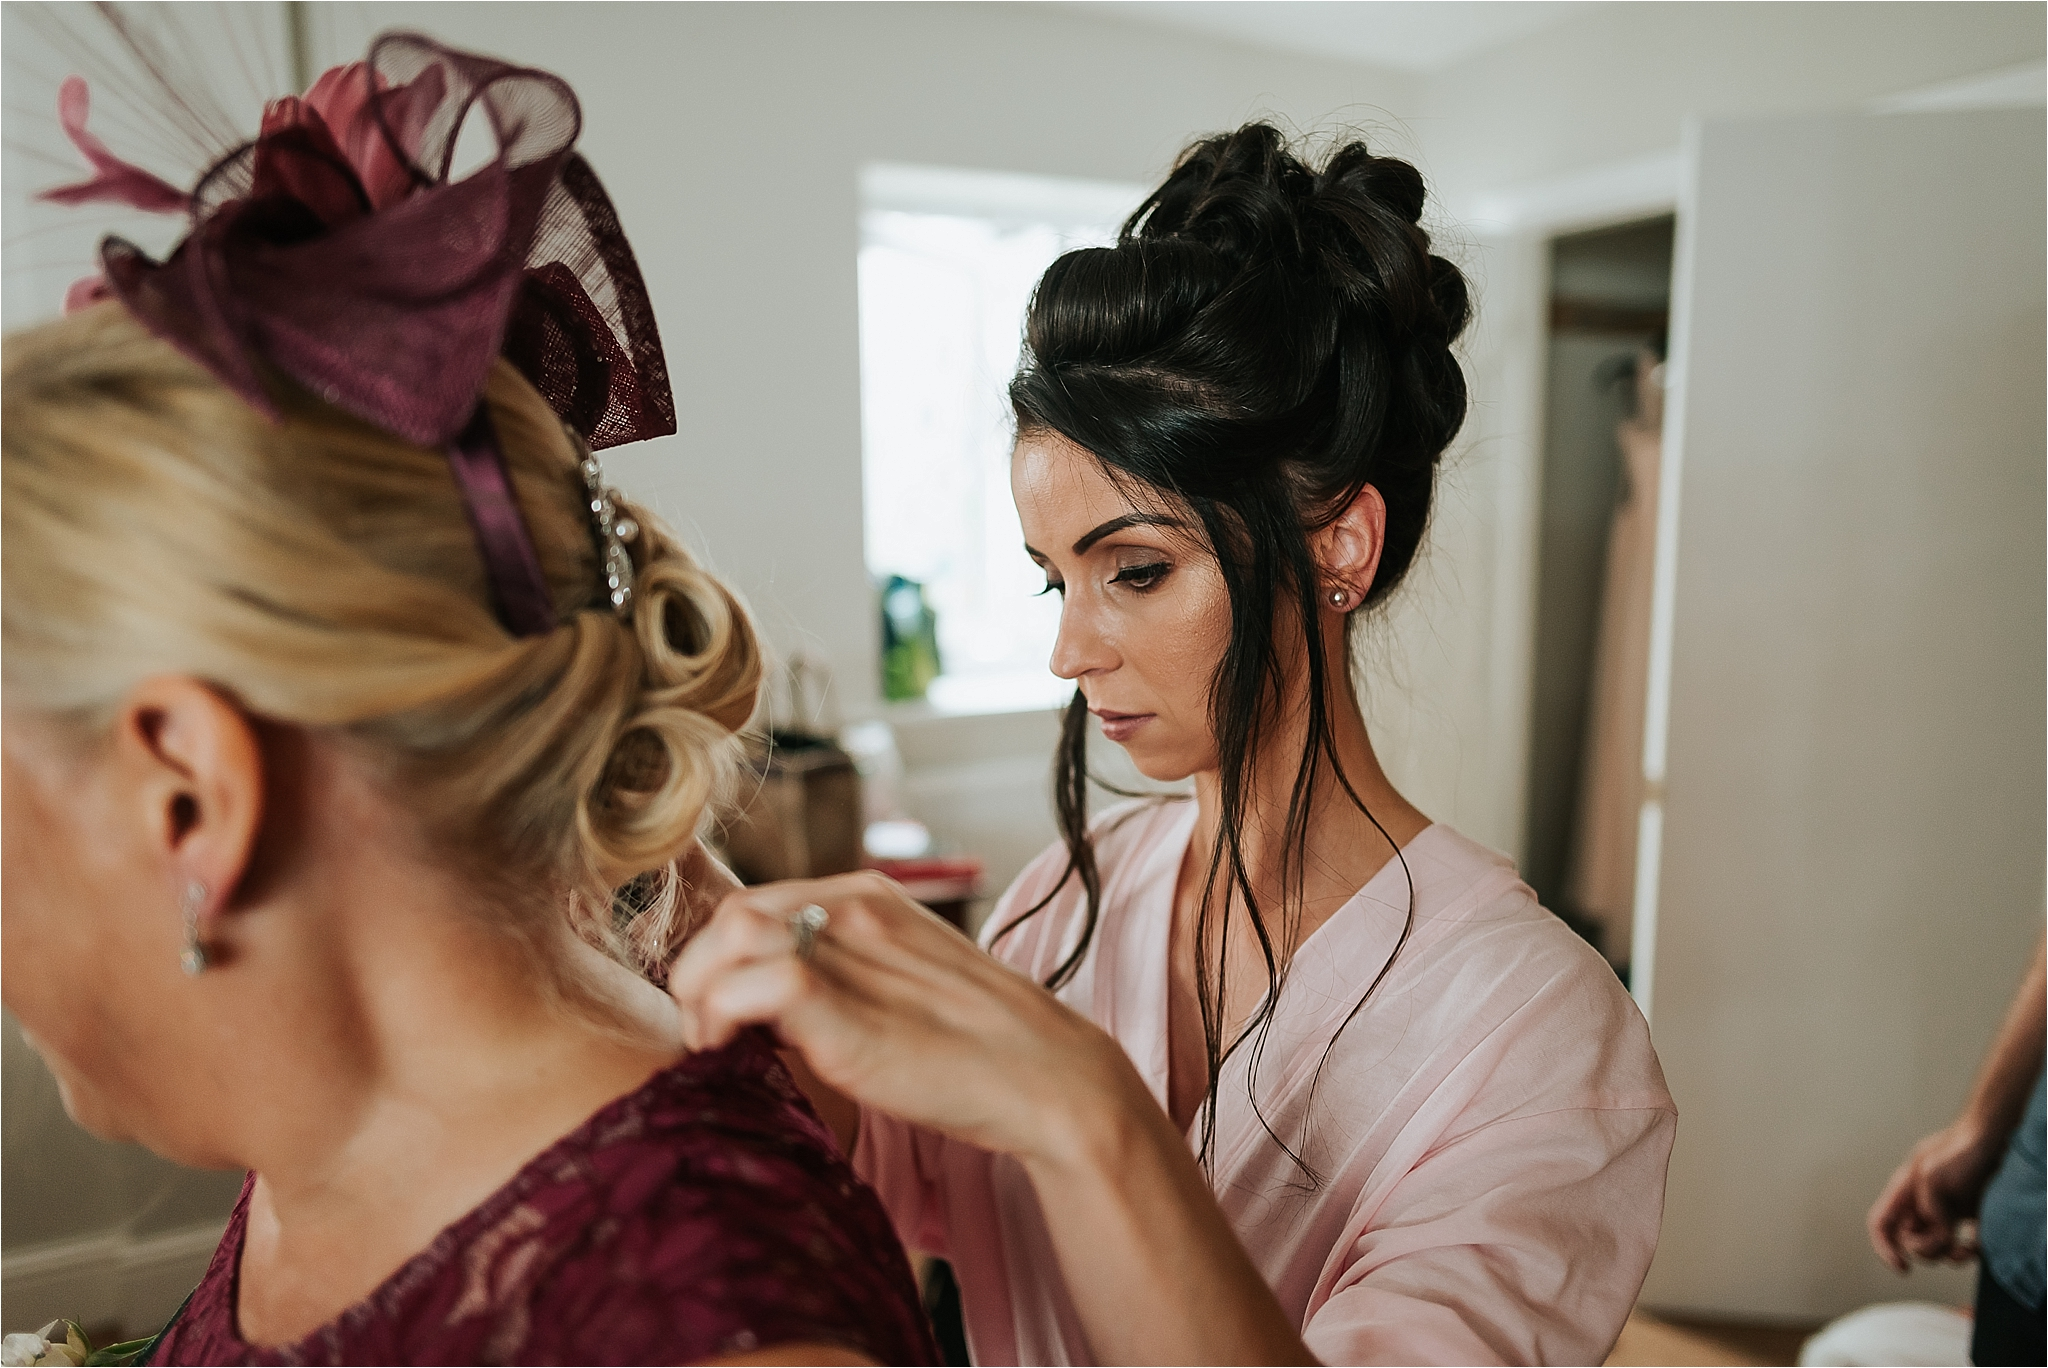 thevilla+lancashire+wreagreen+wedding+photographer86.jpg